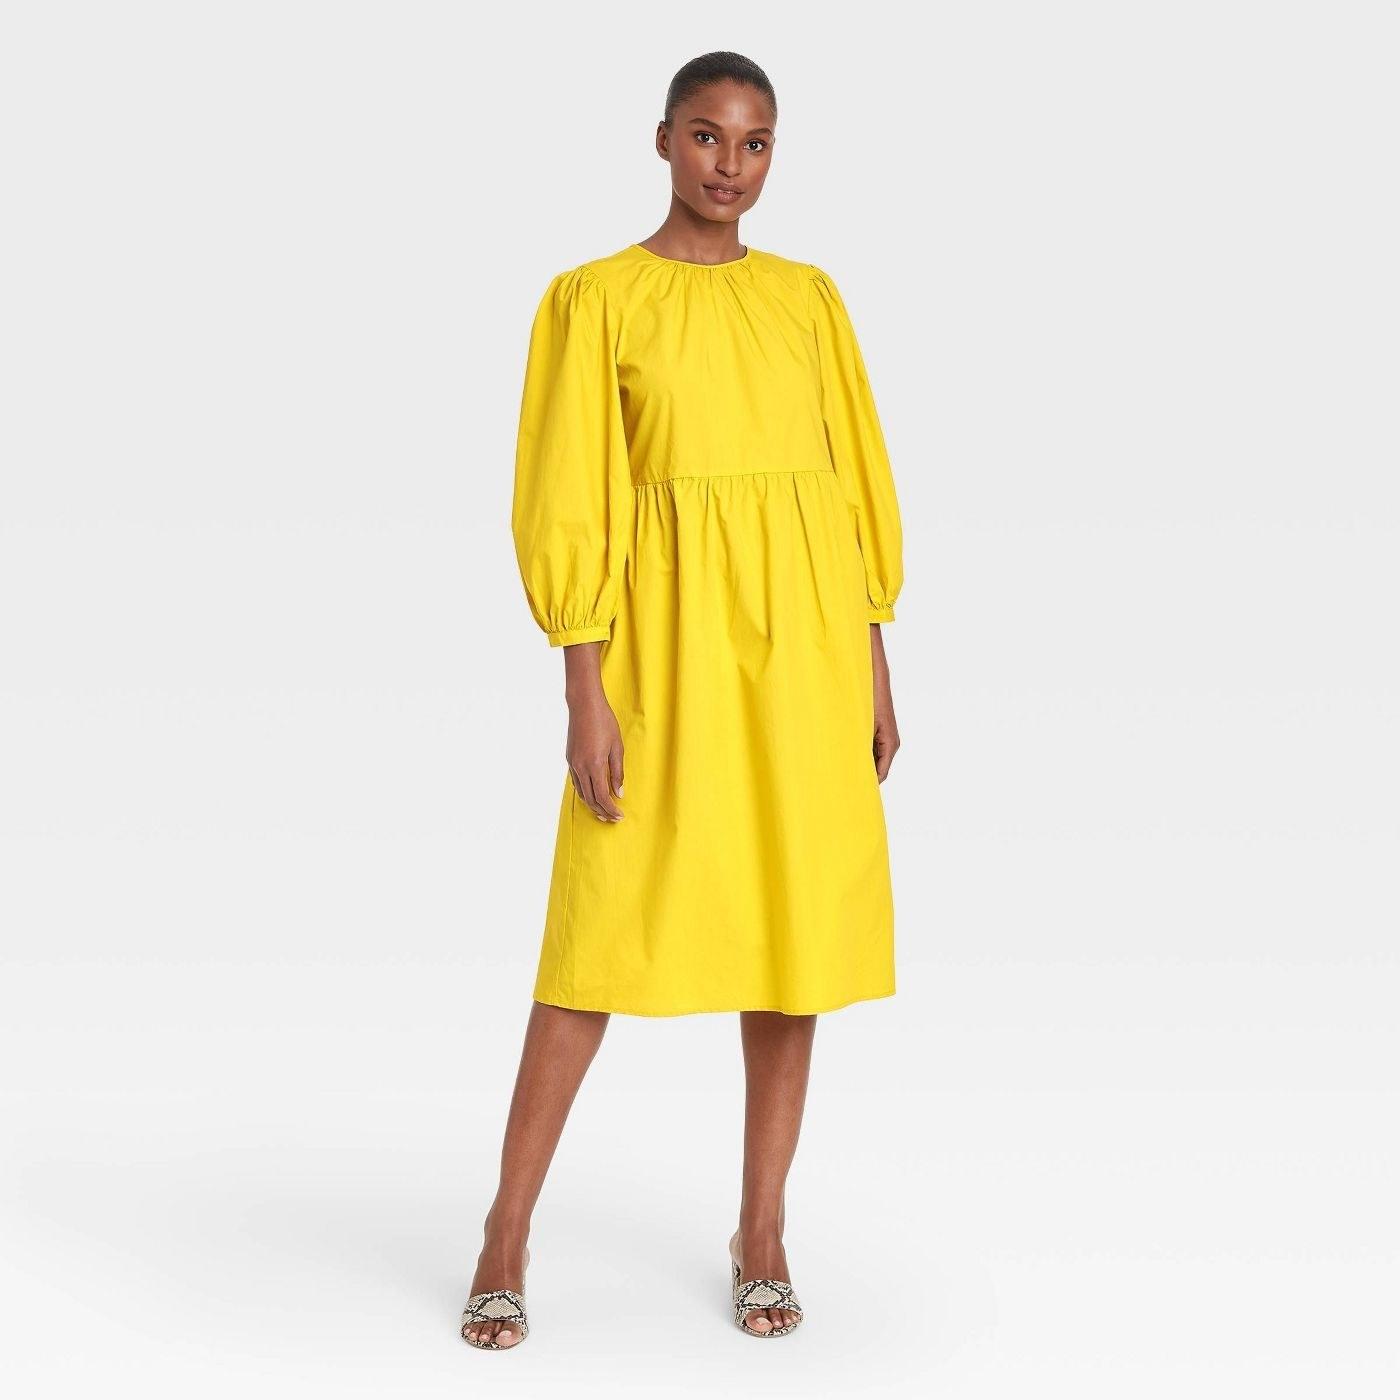 Model wearing bright yellow midi dress